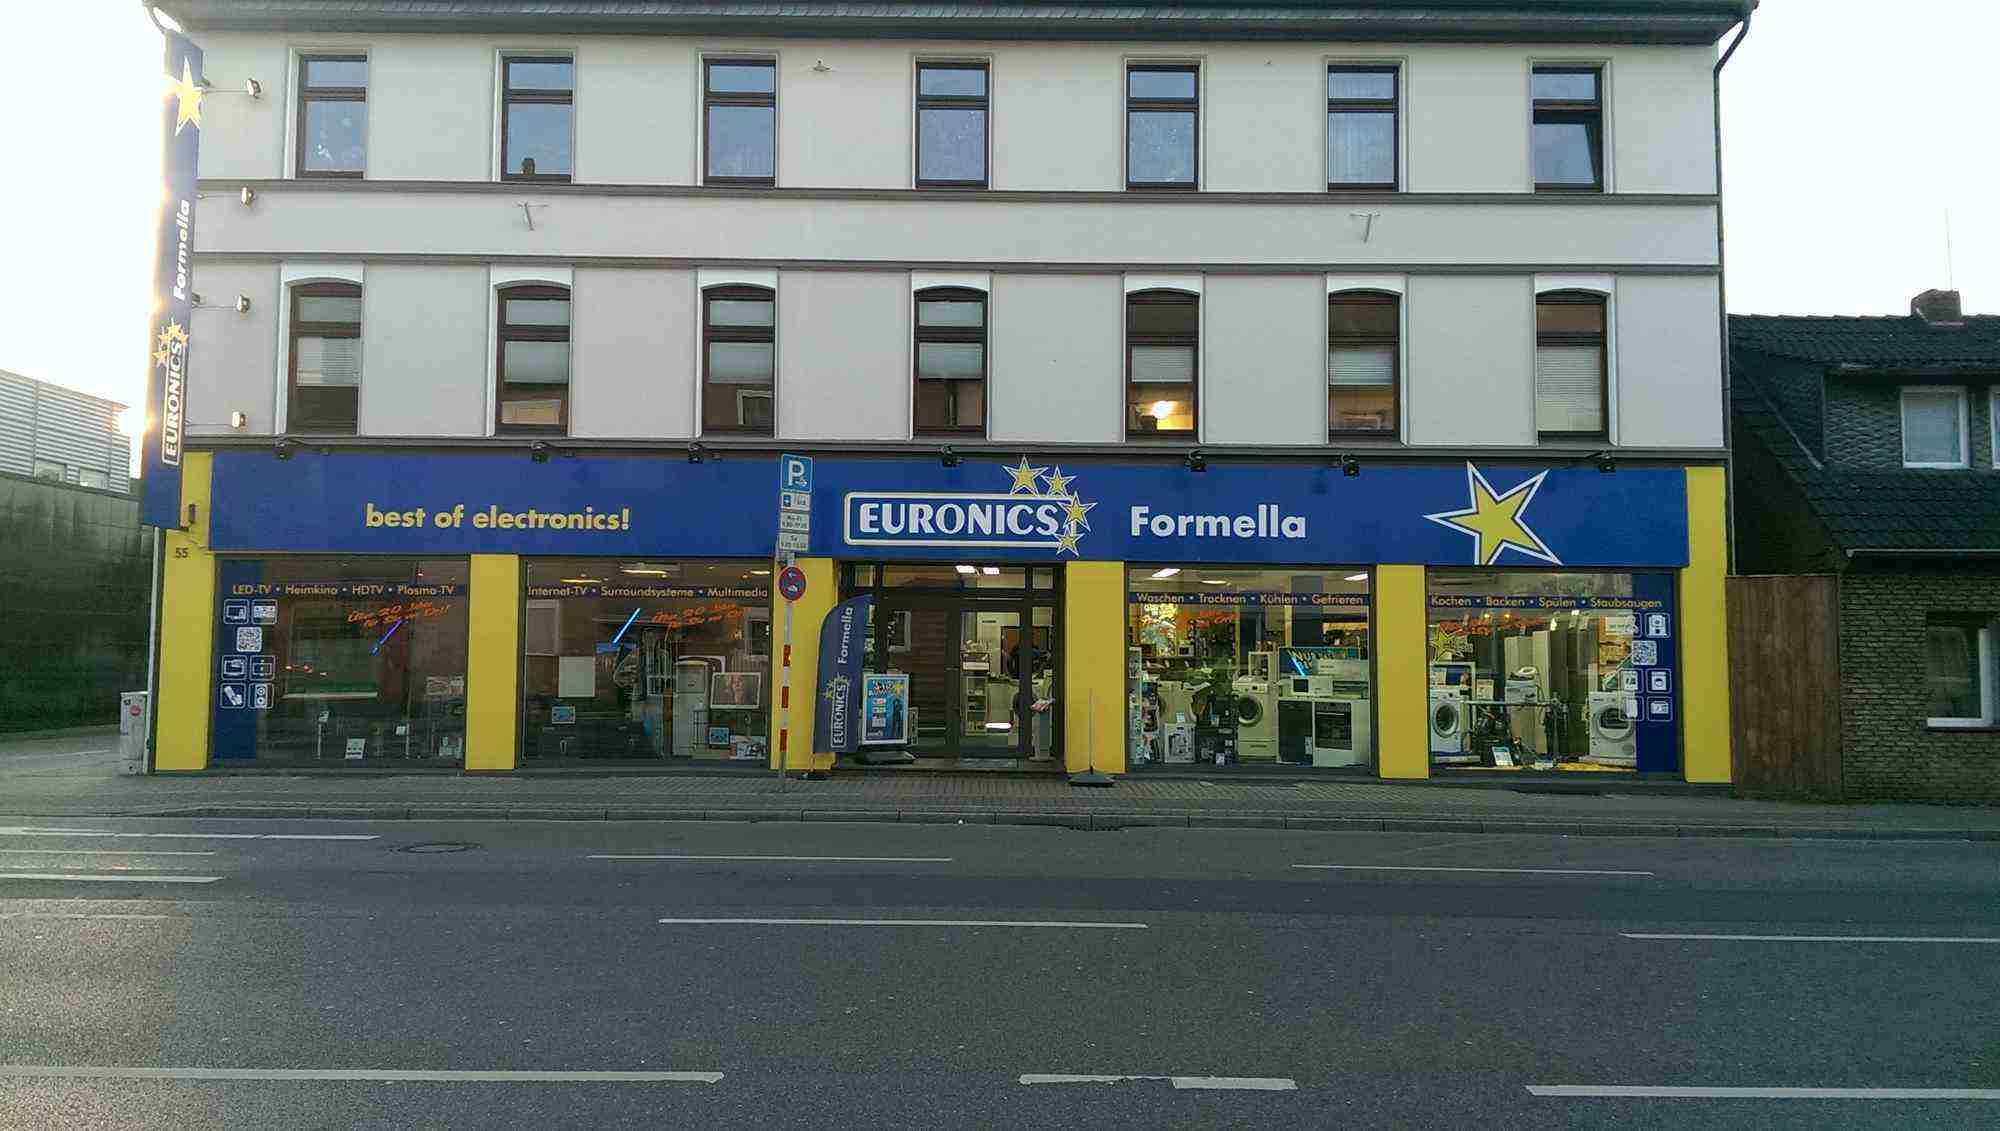 Smartphone Reparatur Bottrop Euronics Formella - Handydoktor